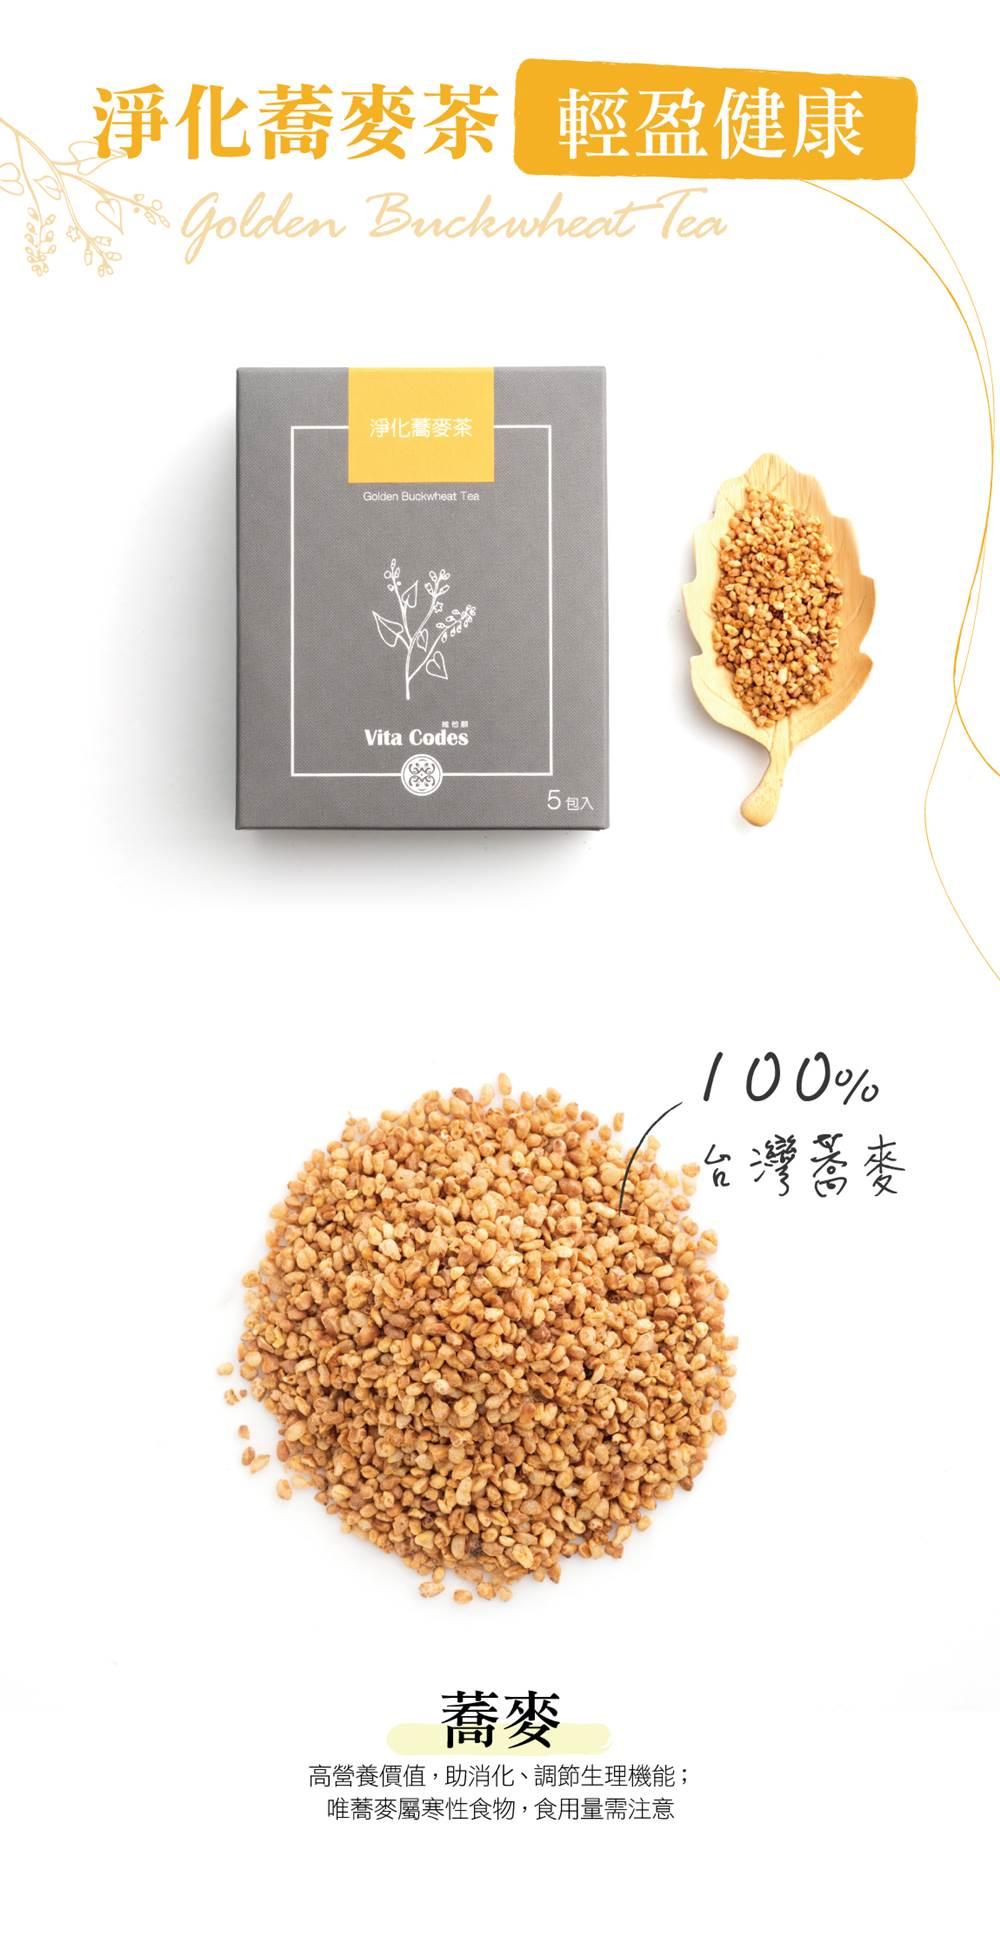 VitaCodes美顏茶-產品介紹07-淨化蕎麥茶-輕盈健康